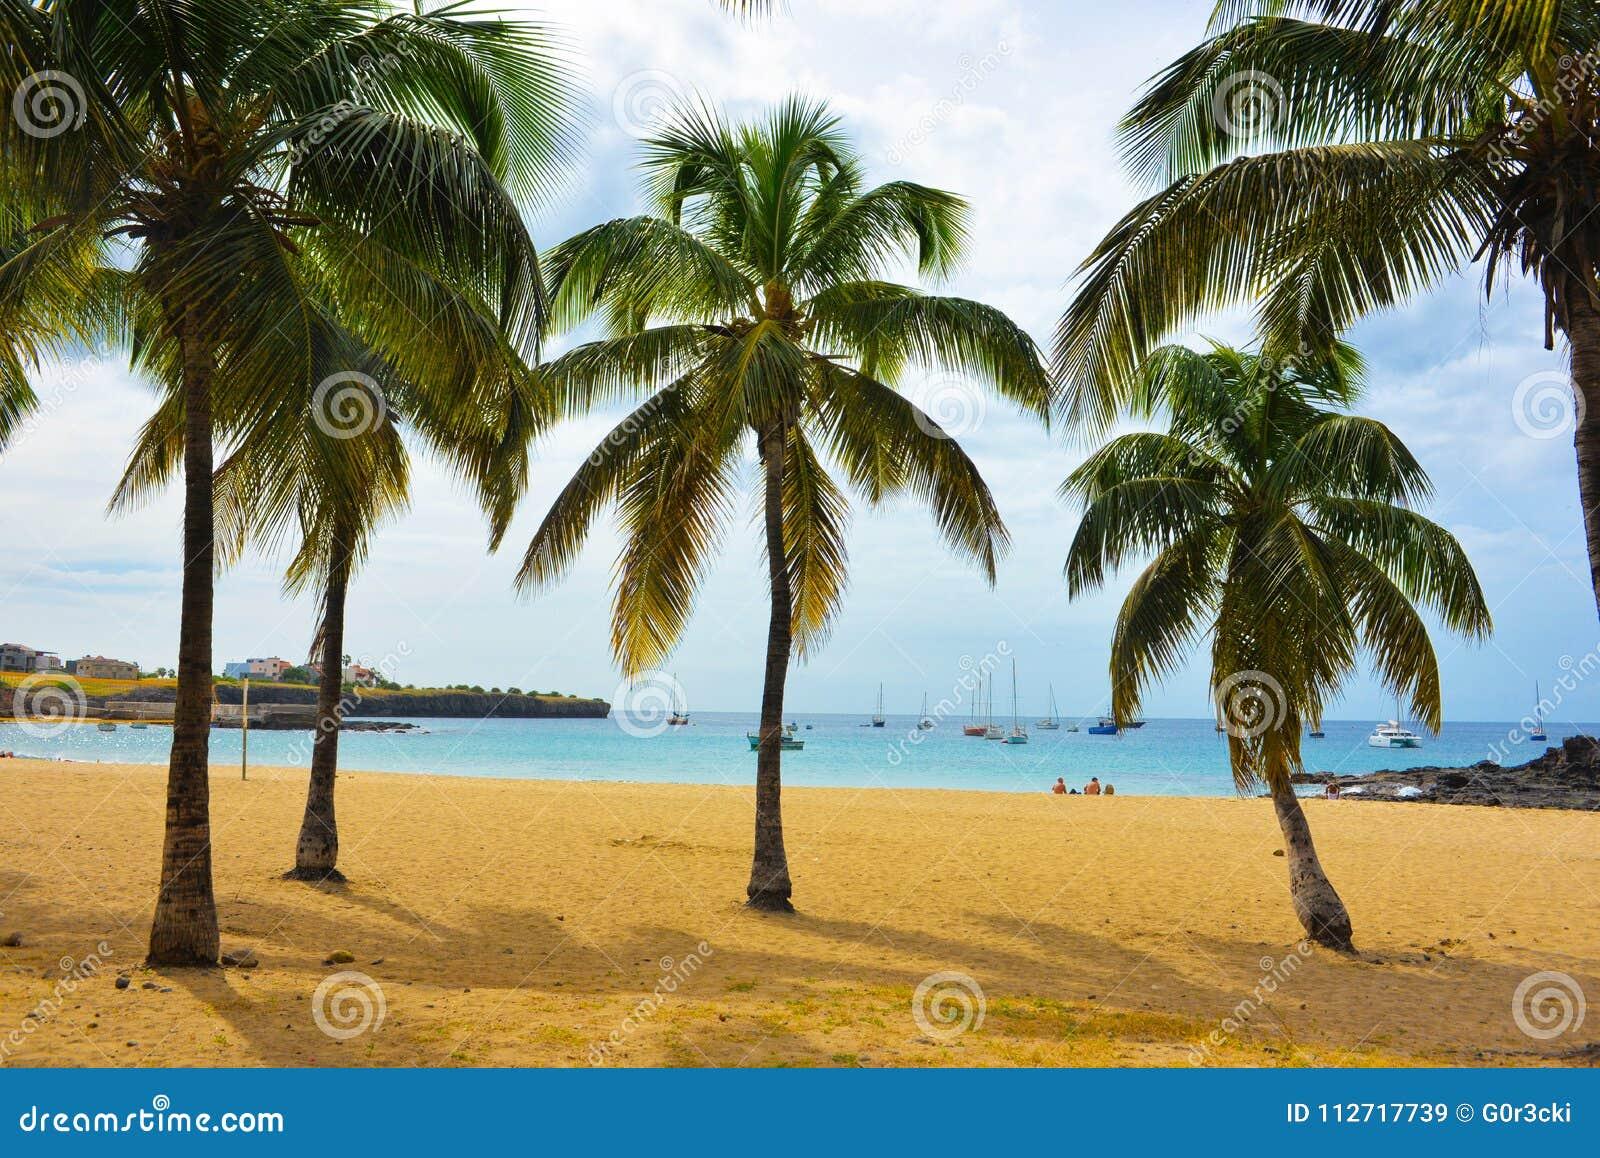 Cape Verde, Tarrafal Bay Beach, Coconuts Trees on Sand, Tropical Landscape, Santiago Island